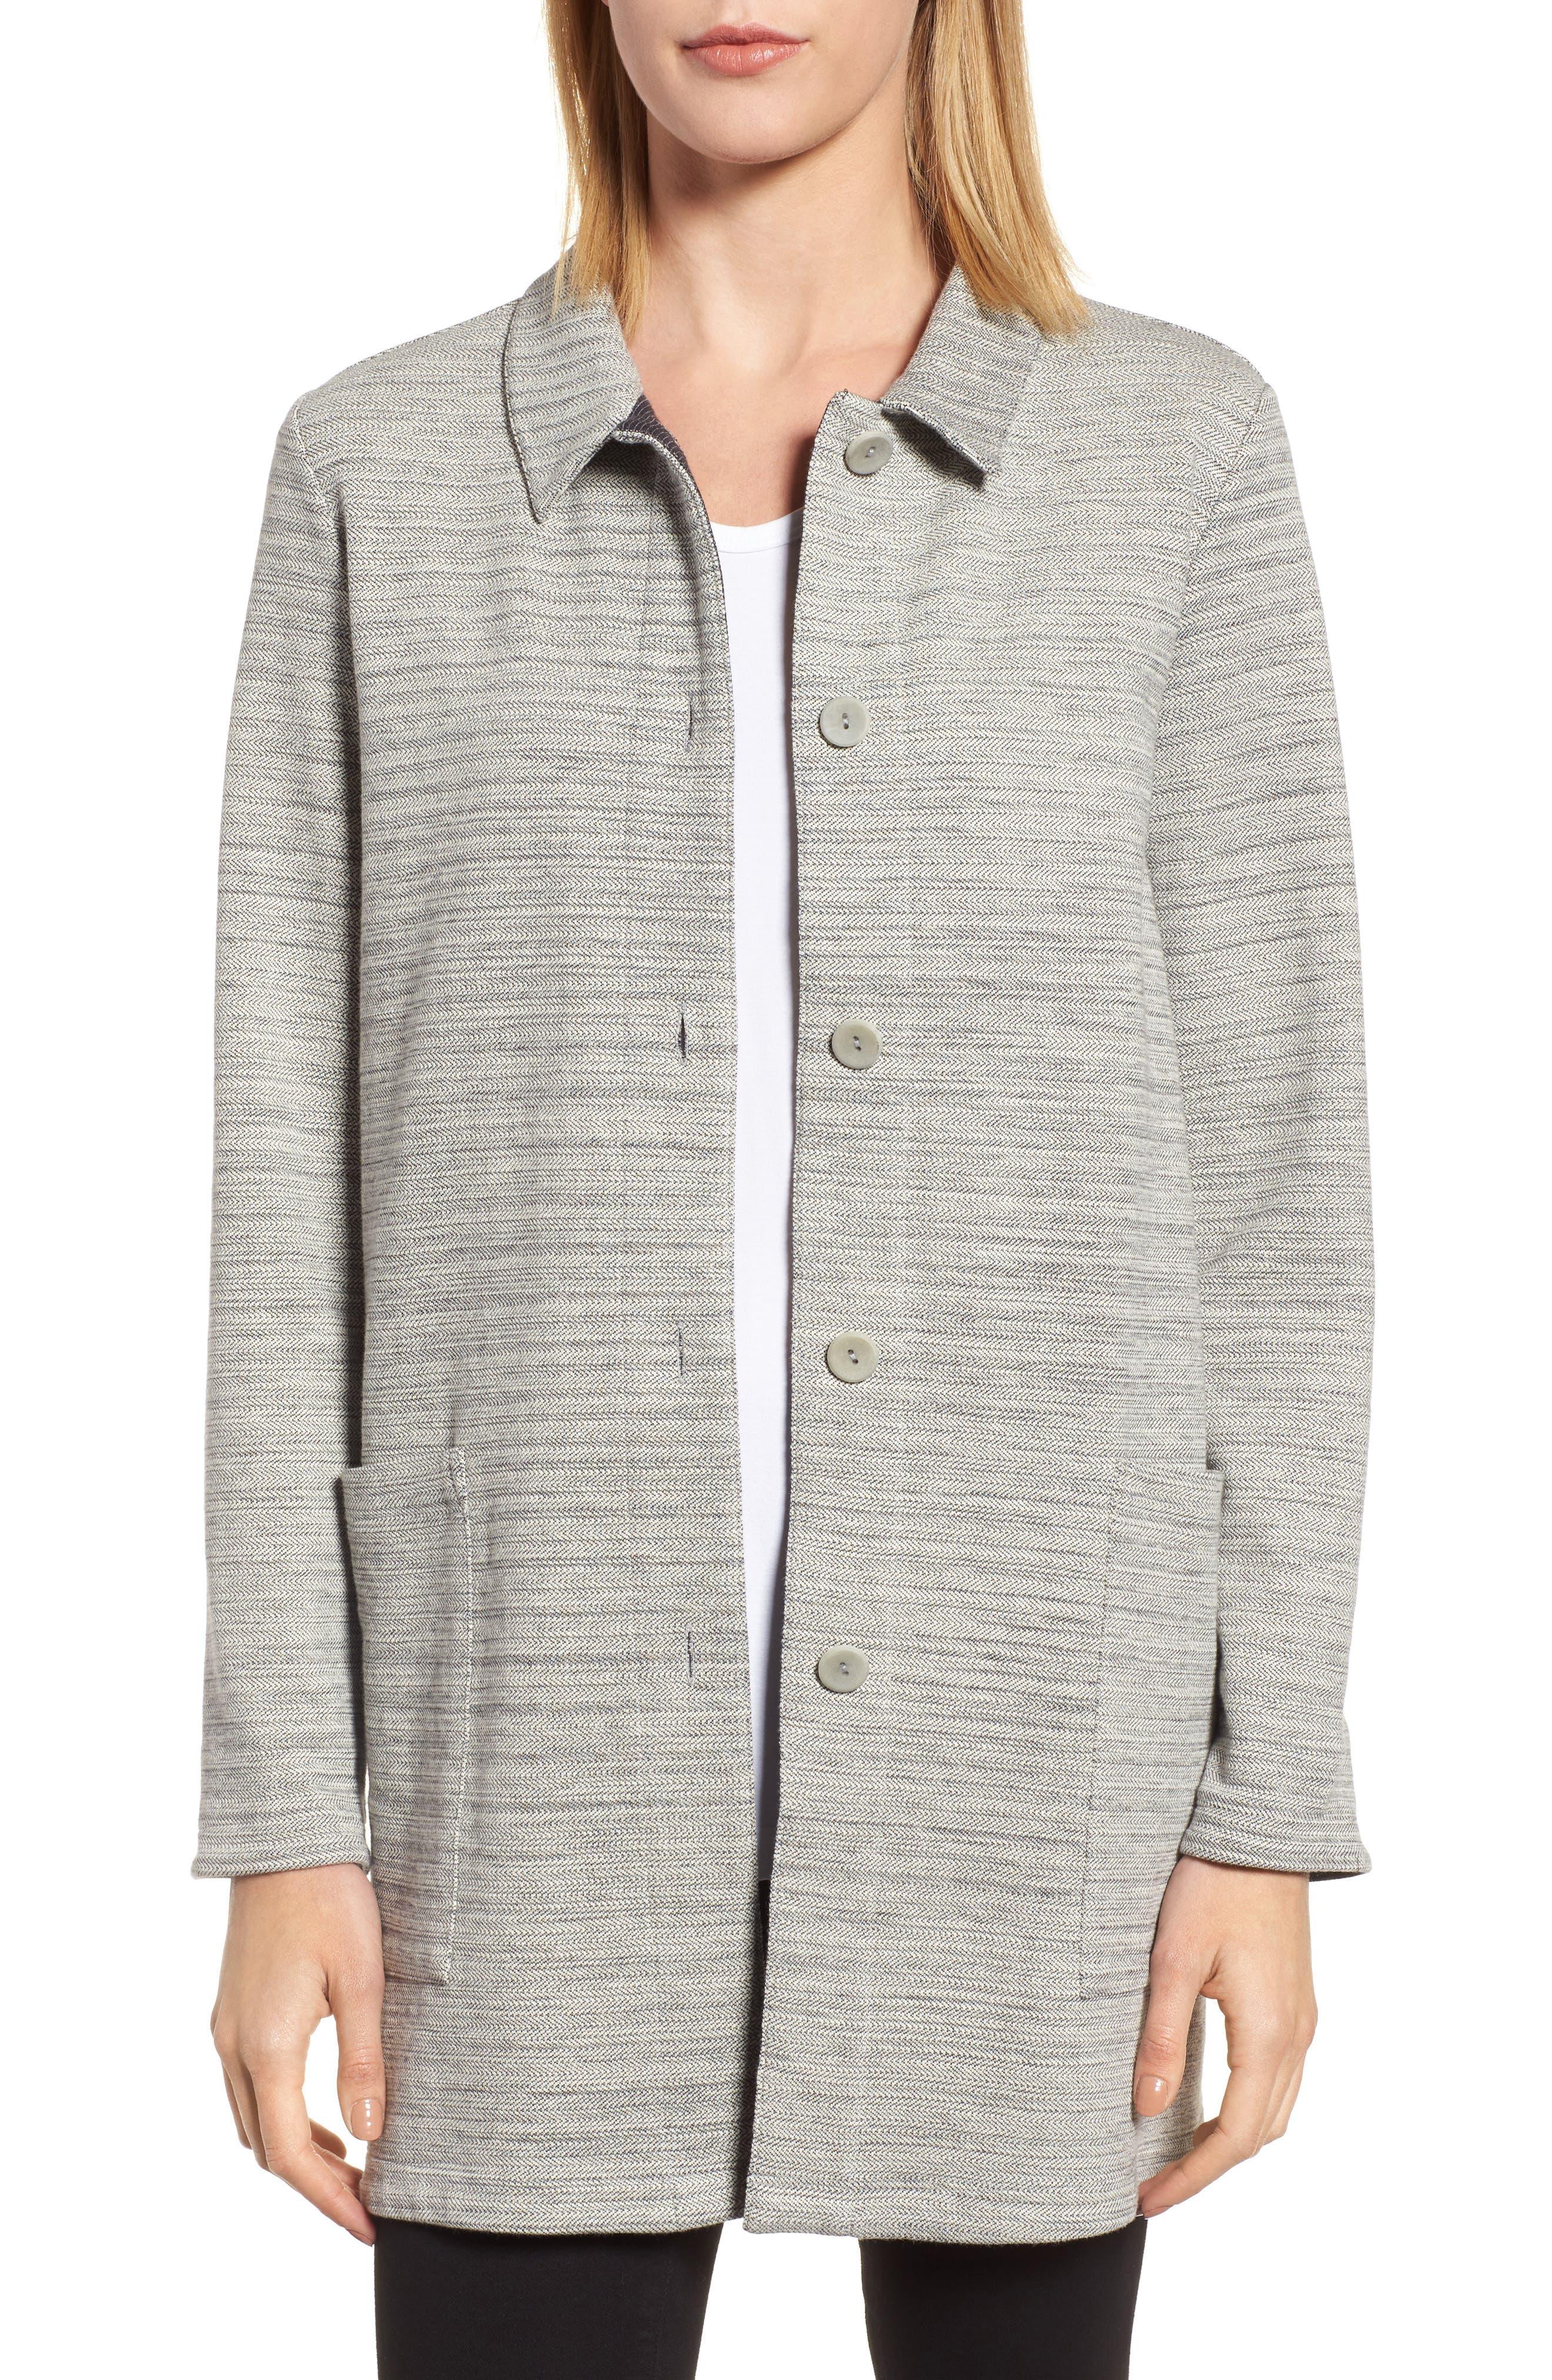 Main Image - Eileen Fisher Cotton Blend Tweed Jacket